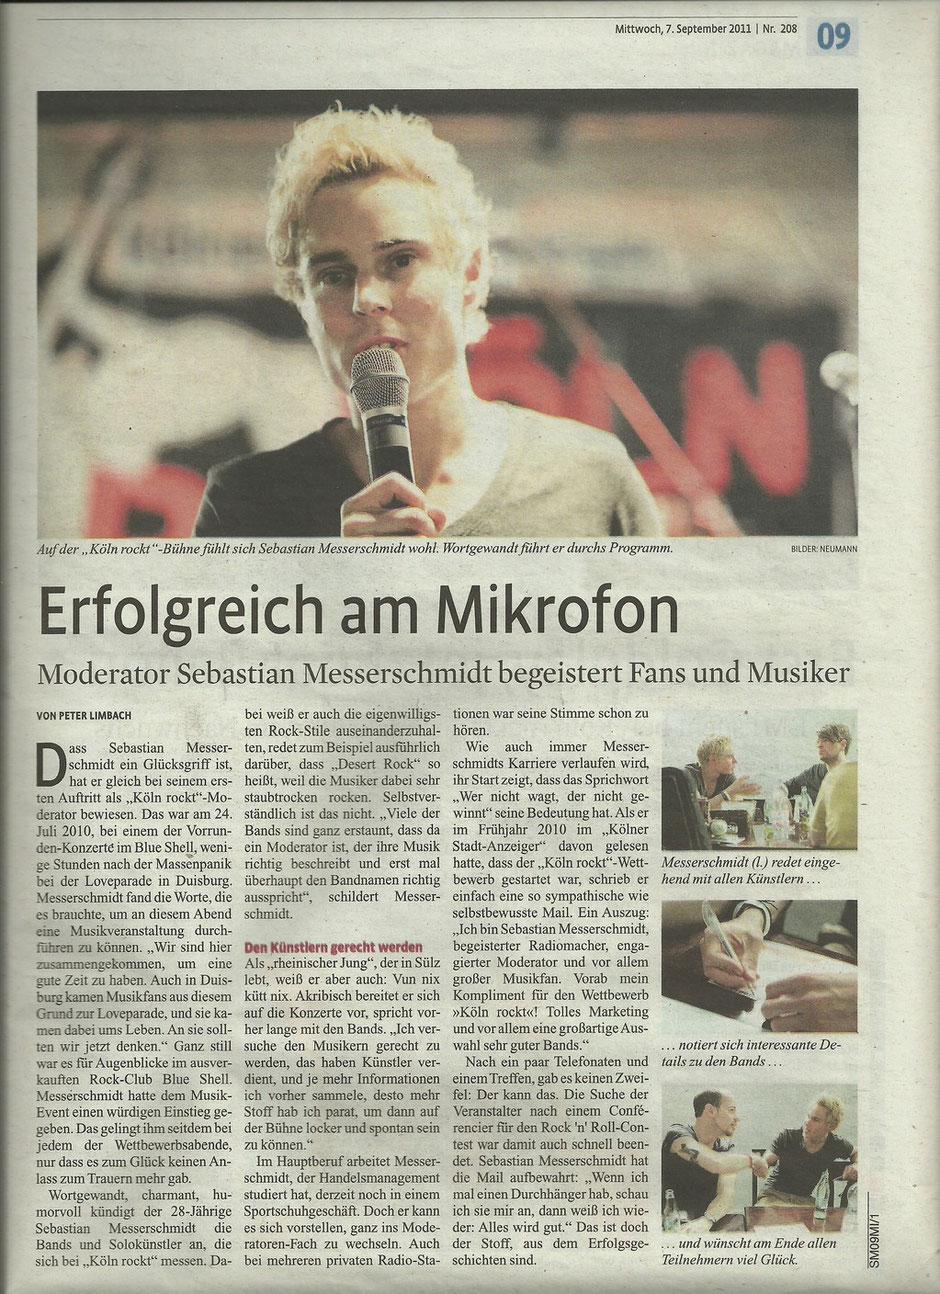 Sonderbeilage Köln rockt 2011